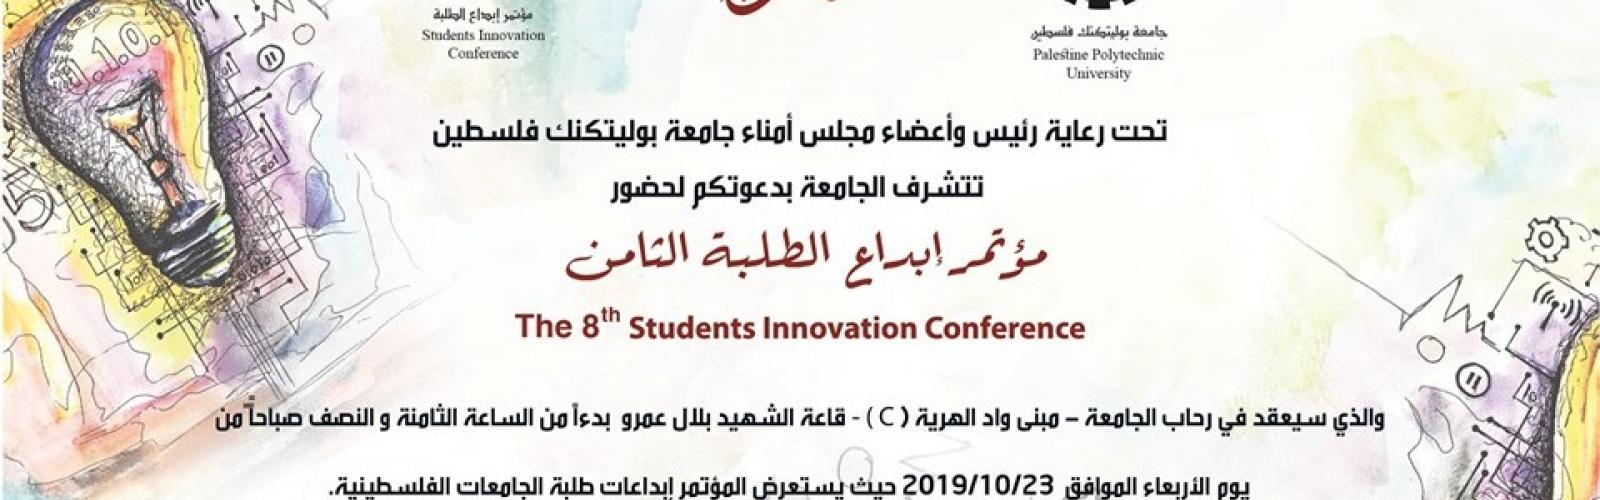 Palestine Polytechnic University (PPU) - مؤتمر إبداع الطلبة الثامن 2019